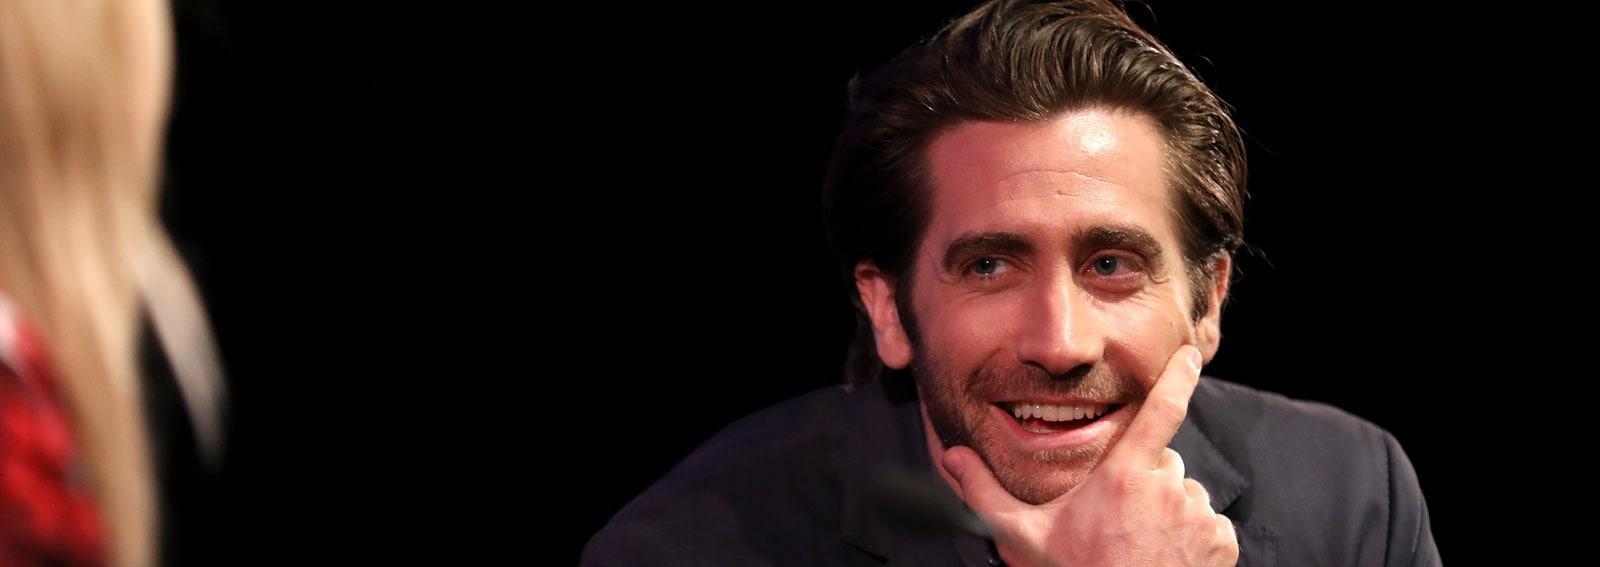 Jake-Gyllenhaal-cover-desktop